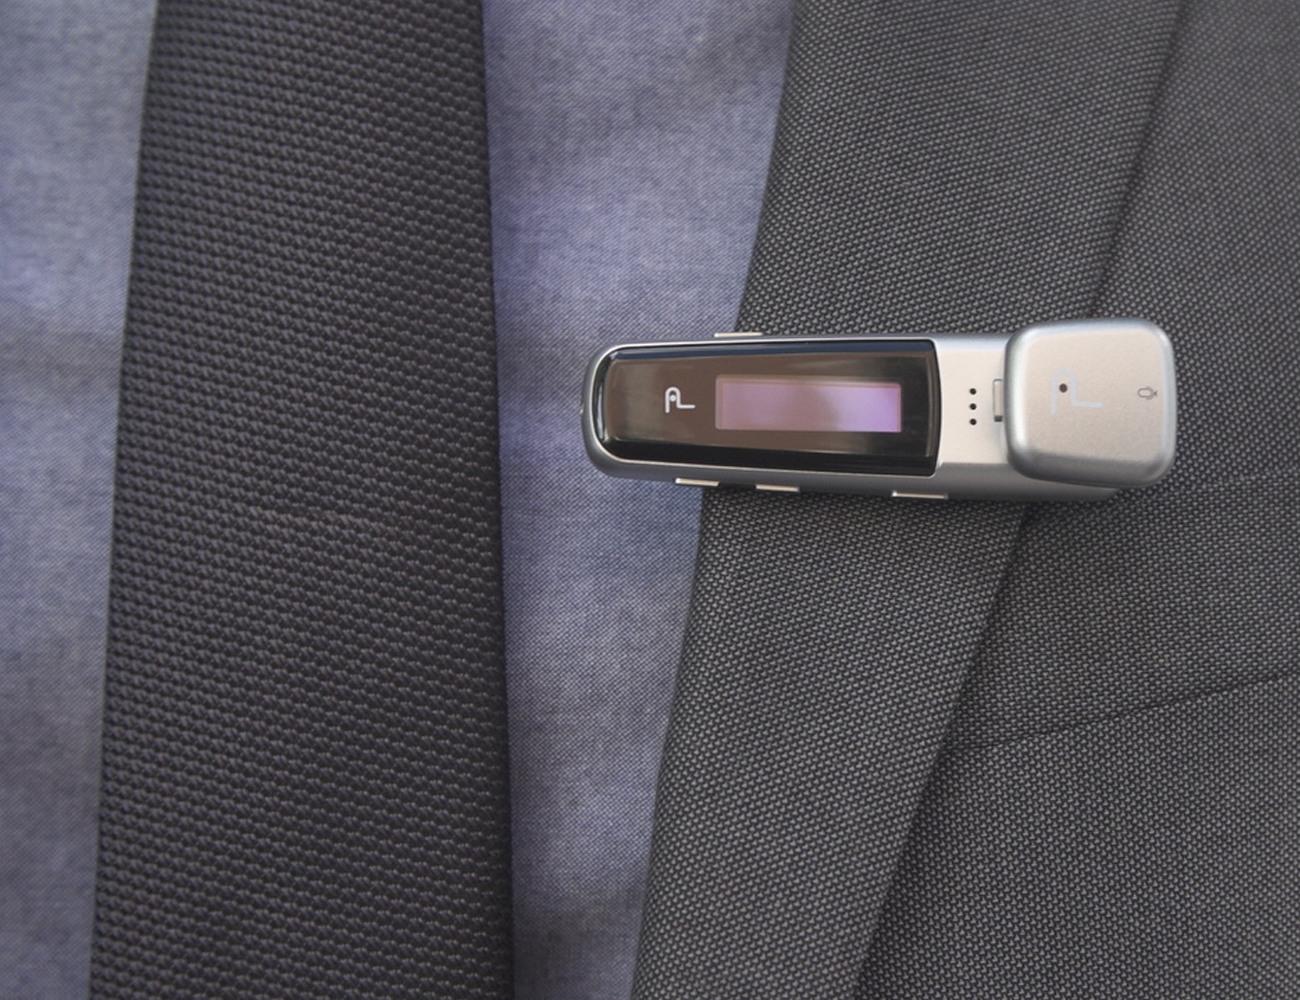 Pinn Wearable Smartphone Hands-Free Device